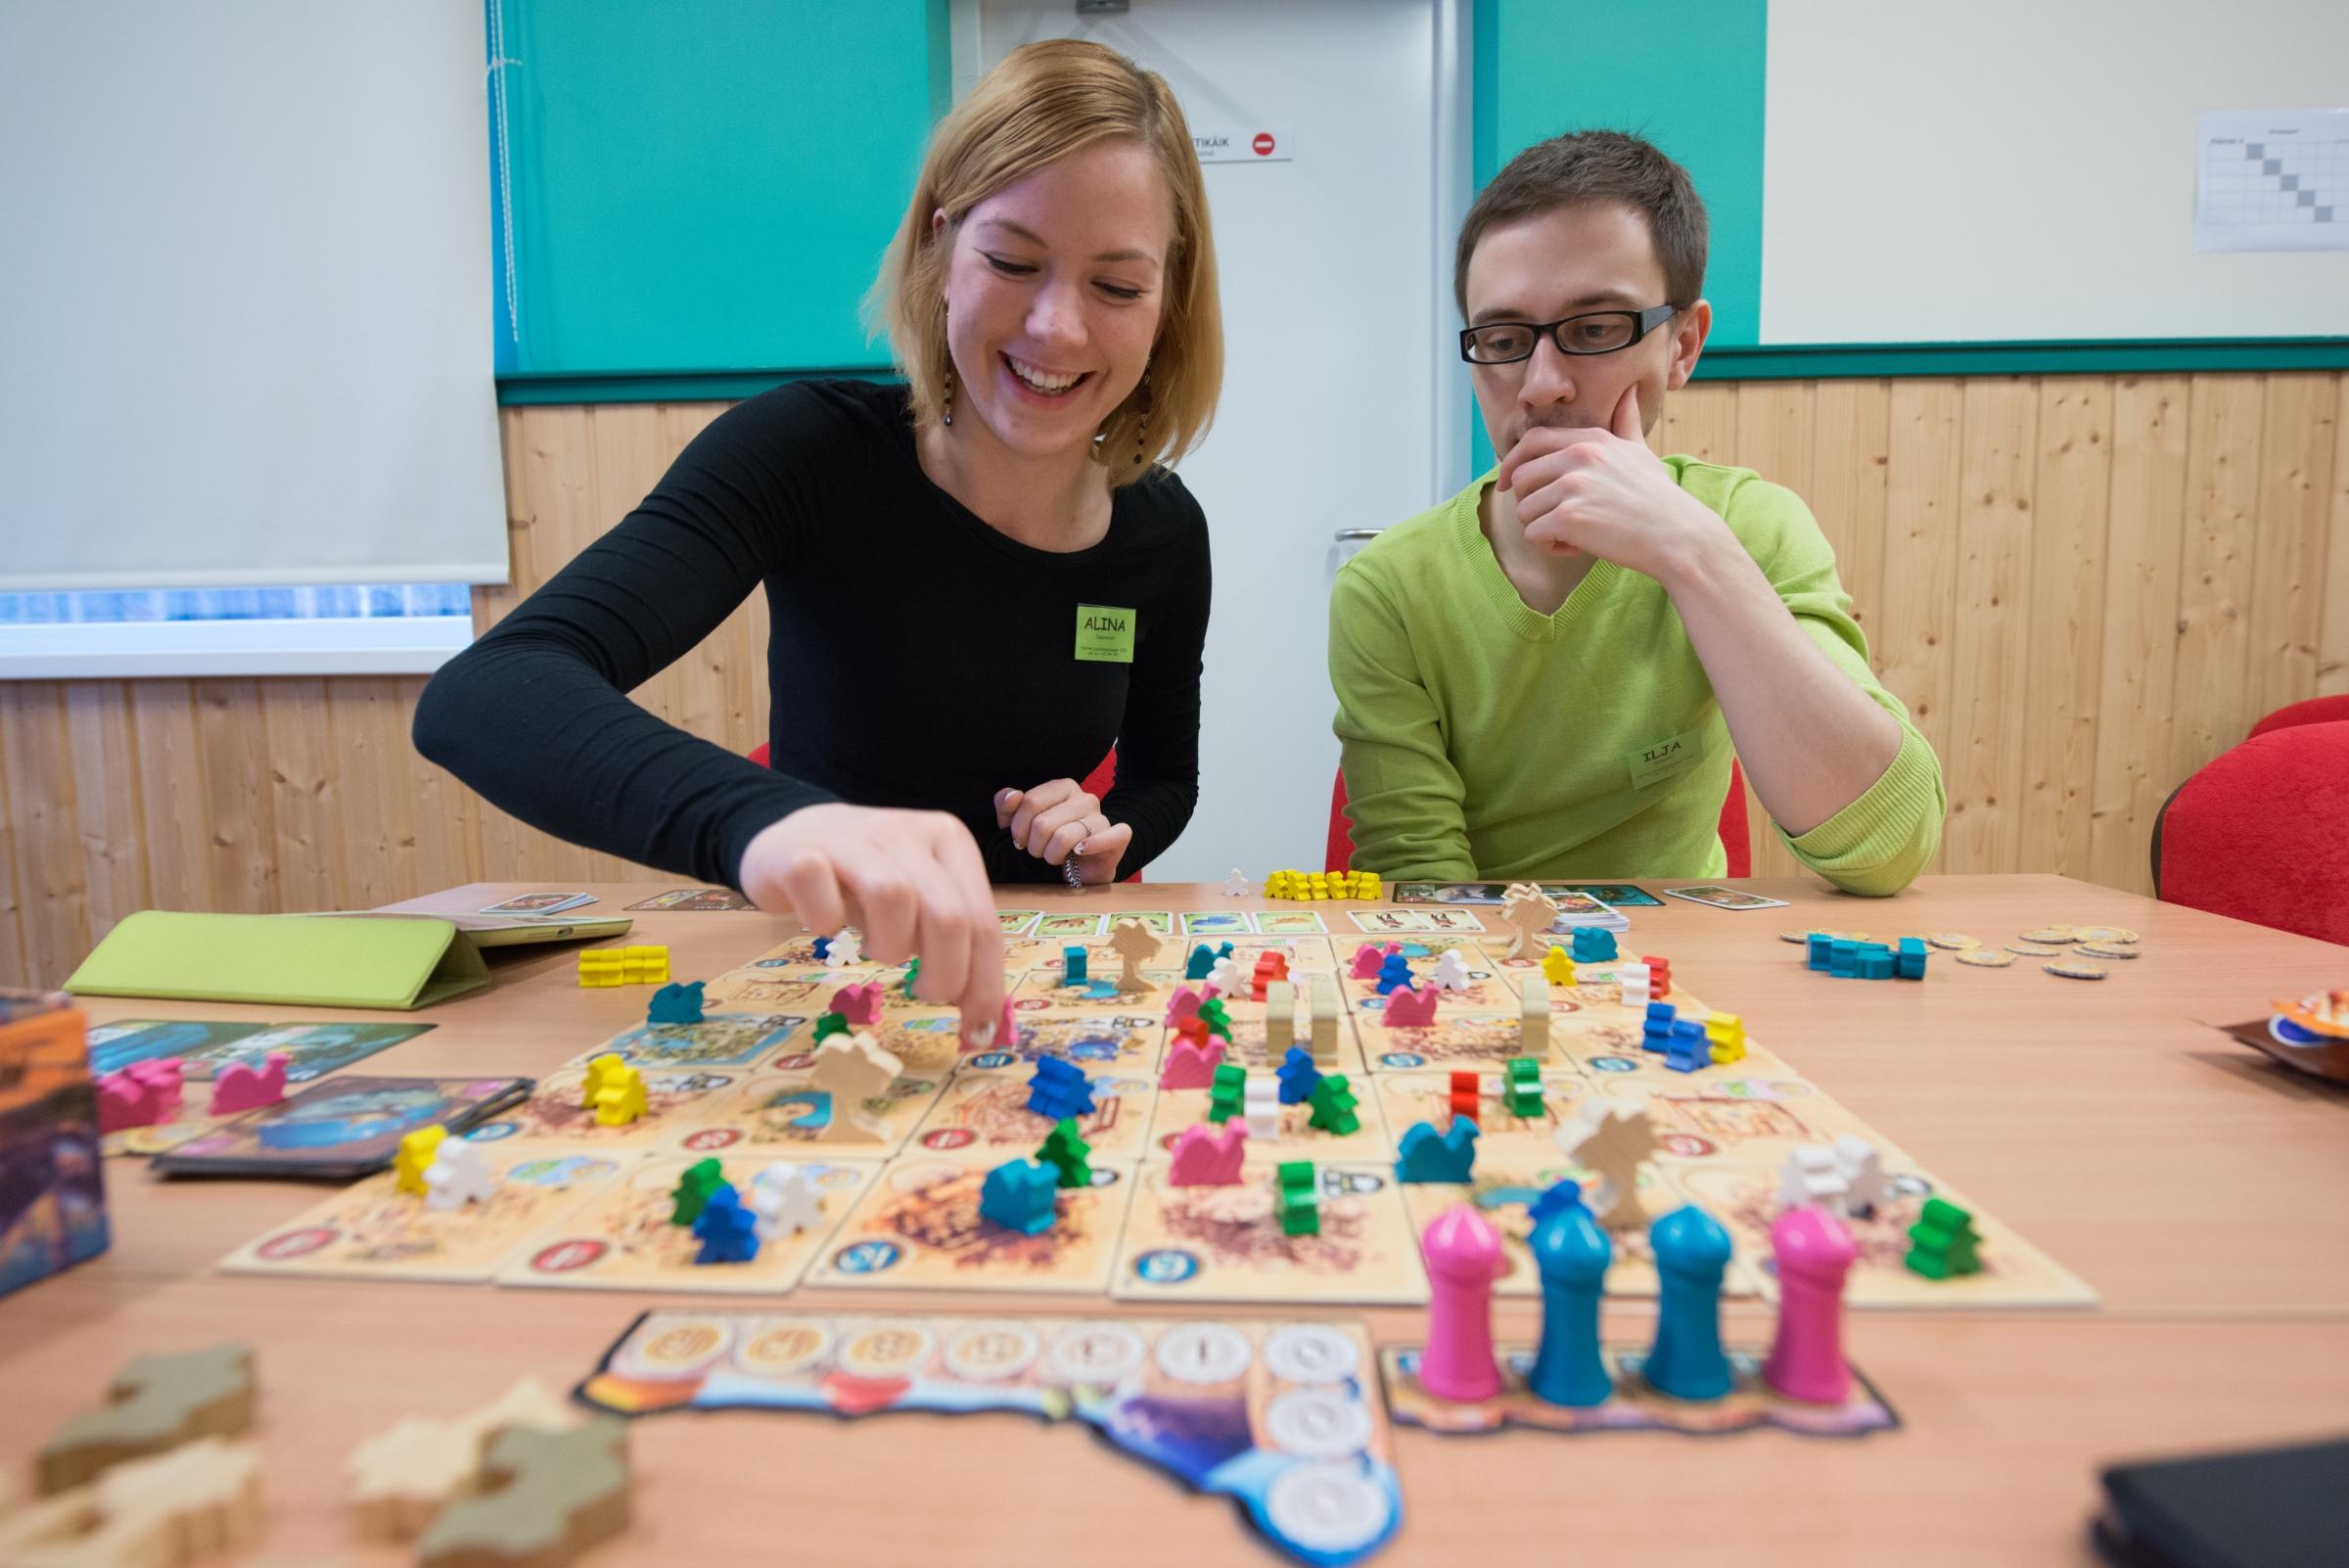 Five Tribes - Илья и Алина изучают